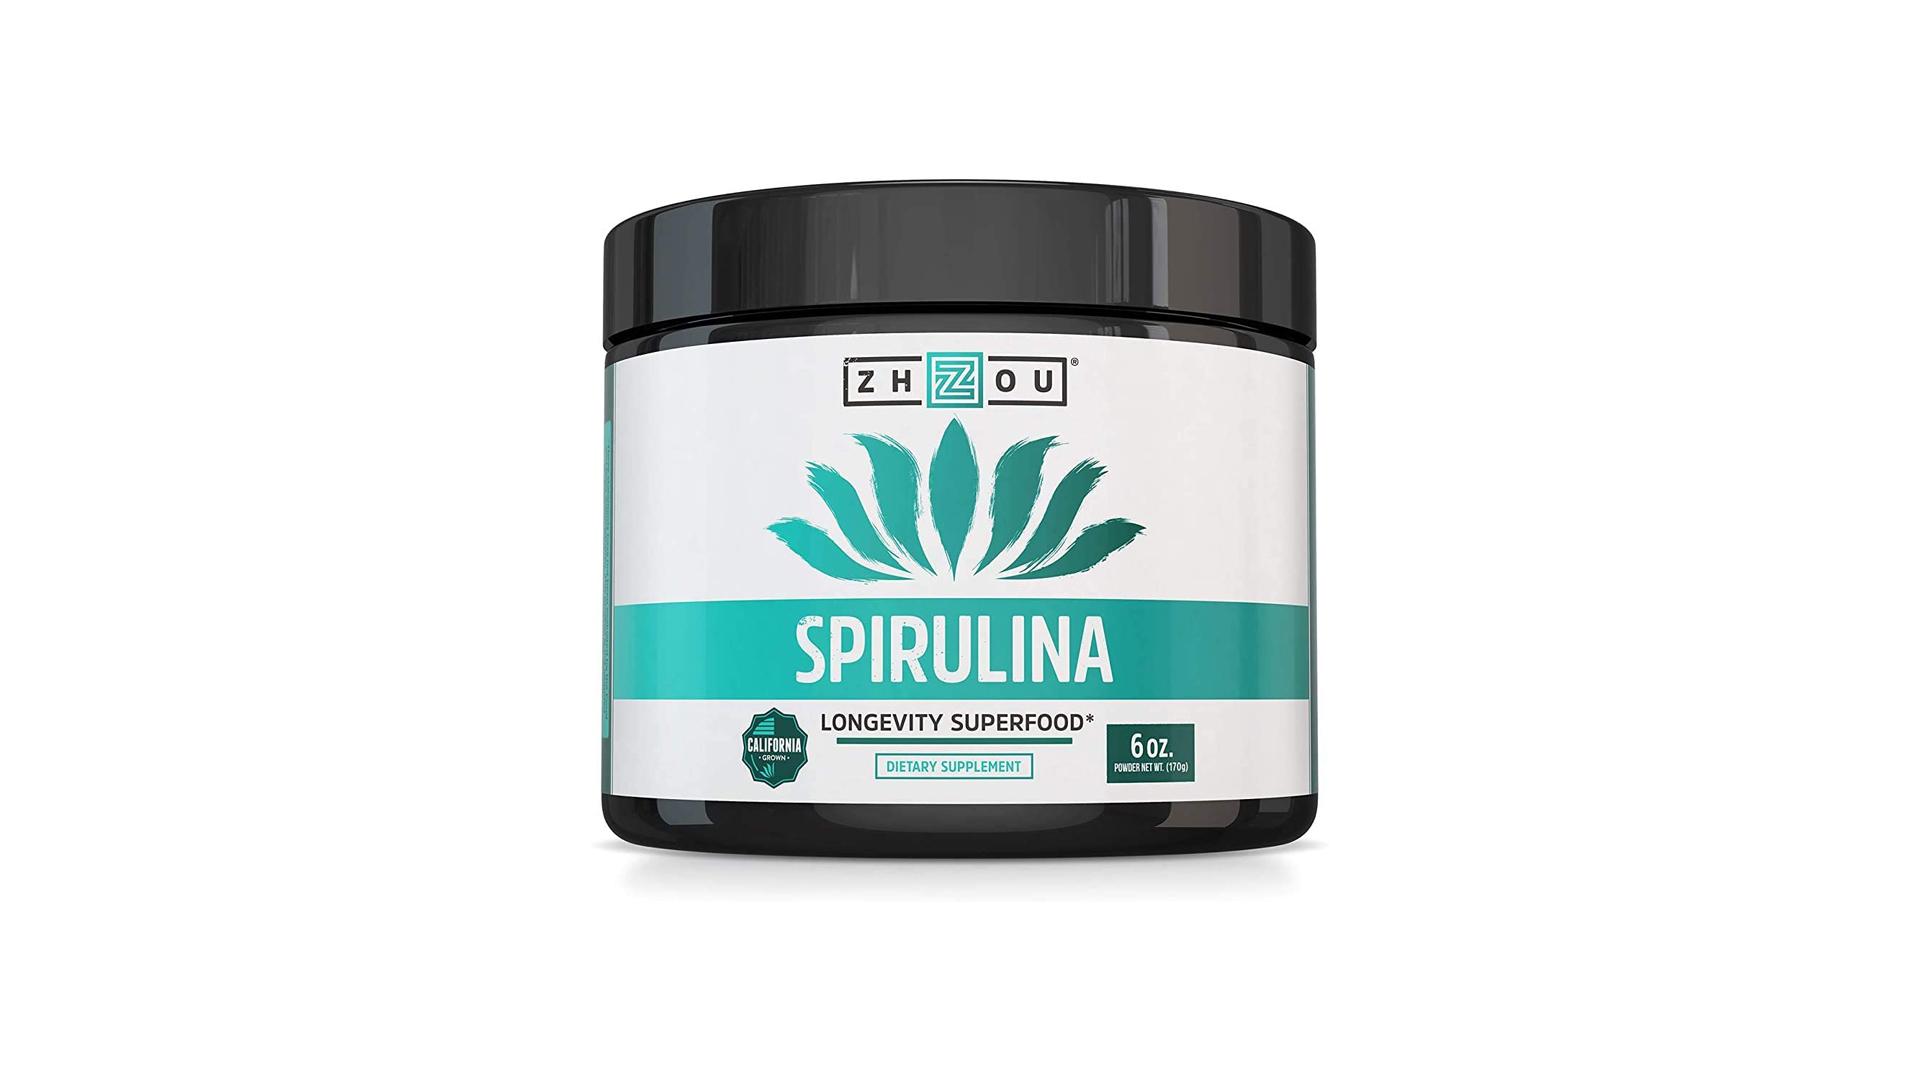 Zhou's Non-GMO Spirulina Powder